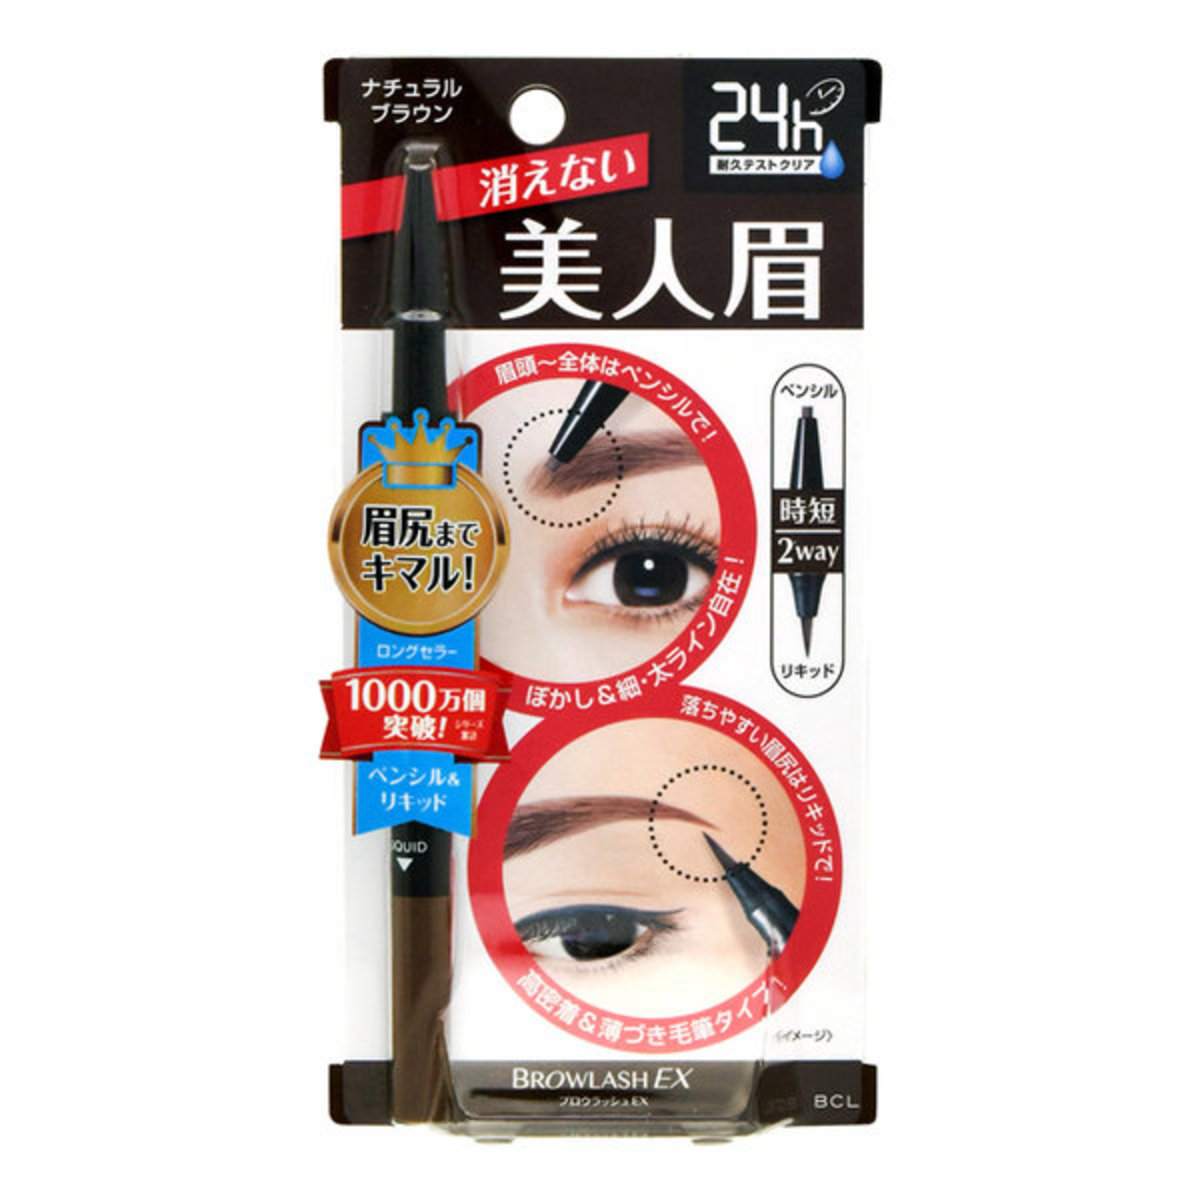 Water Strong W Eyebrow Grayish Brown Pencil Liquid Makeup Grey Brown